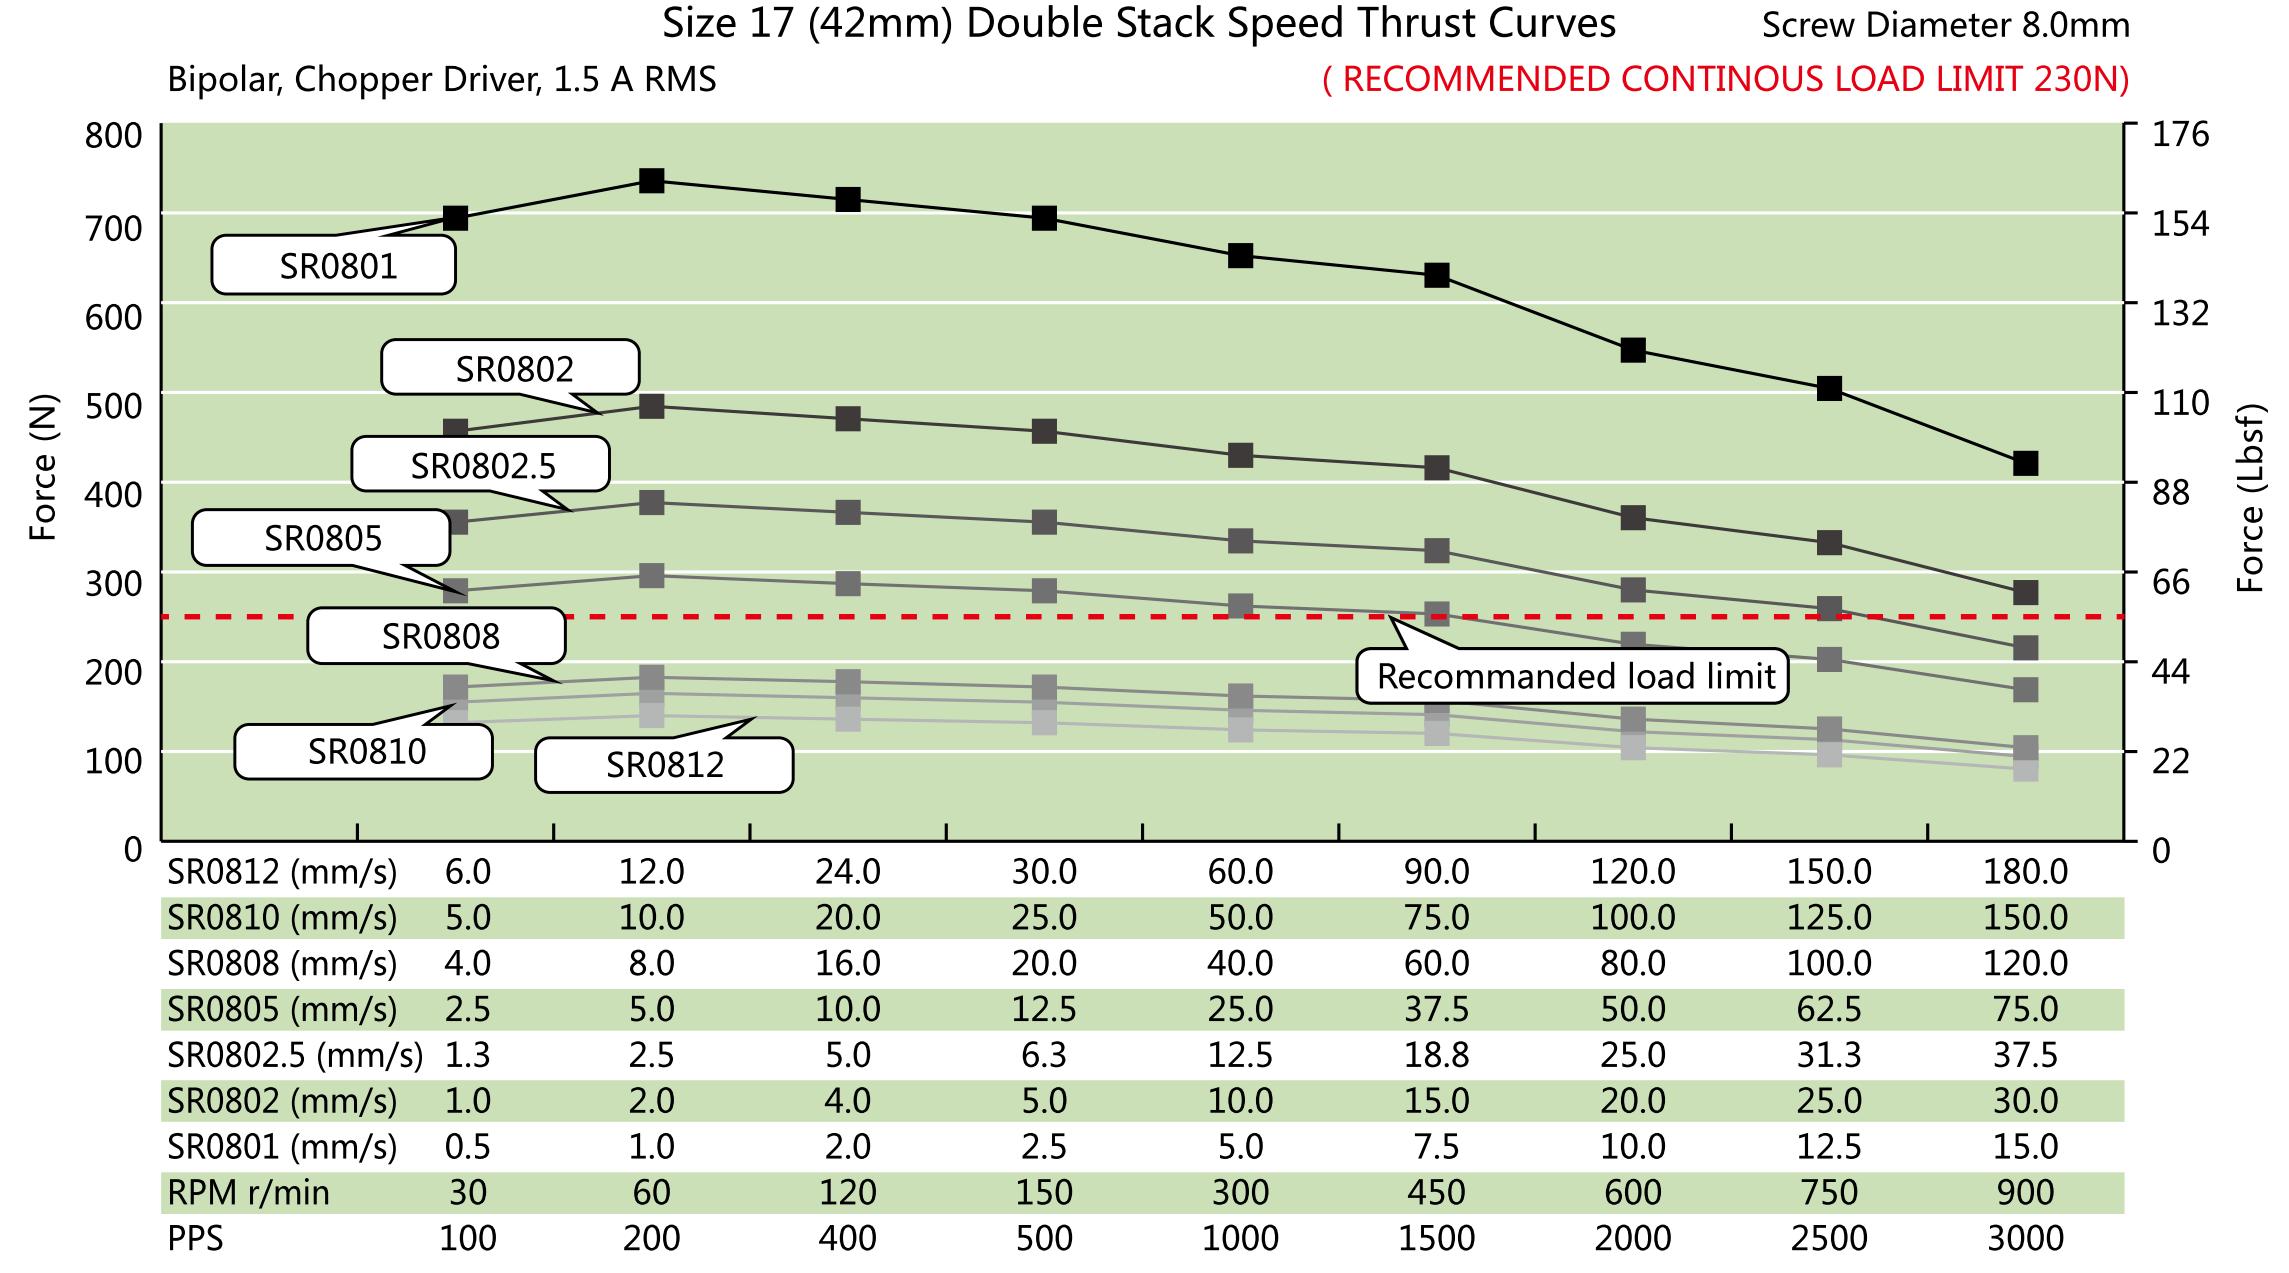 NEMA 17 Double Stack Ball Screw Actuator Speed Thrust Curve